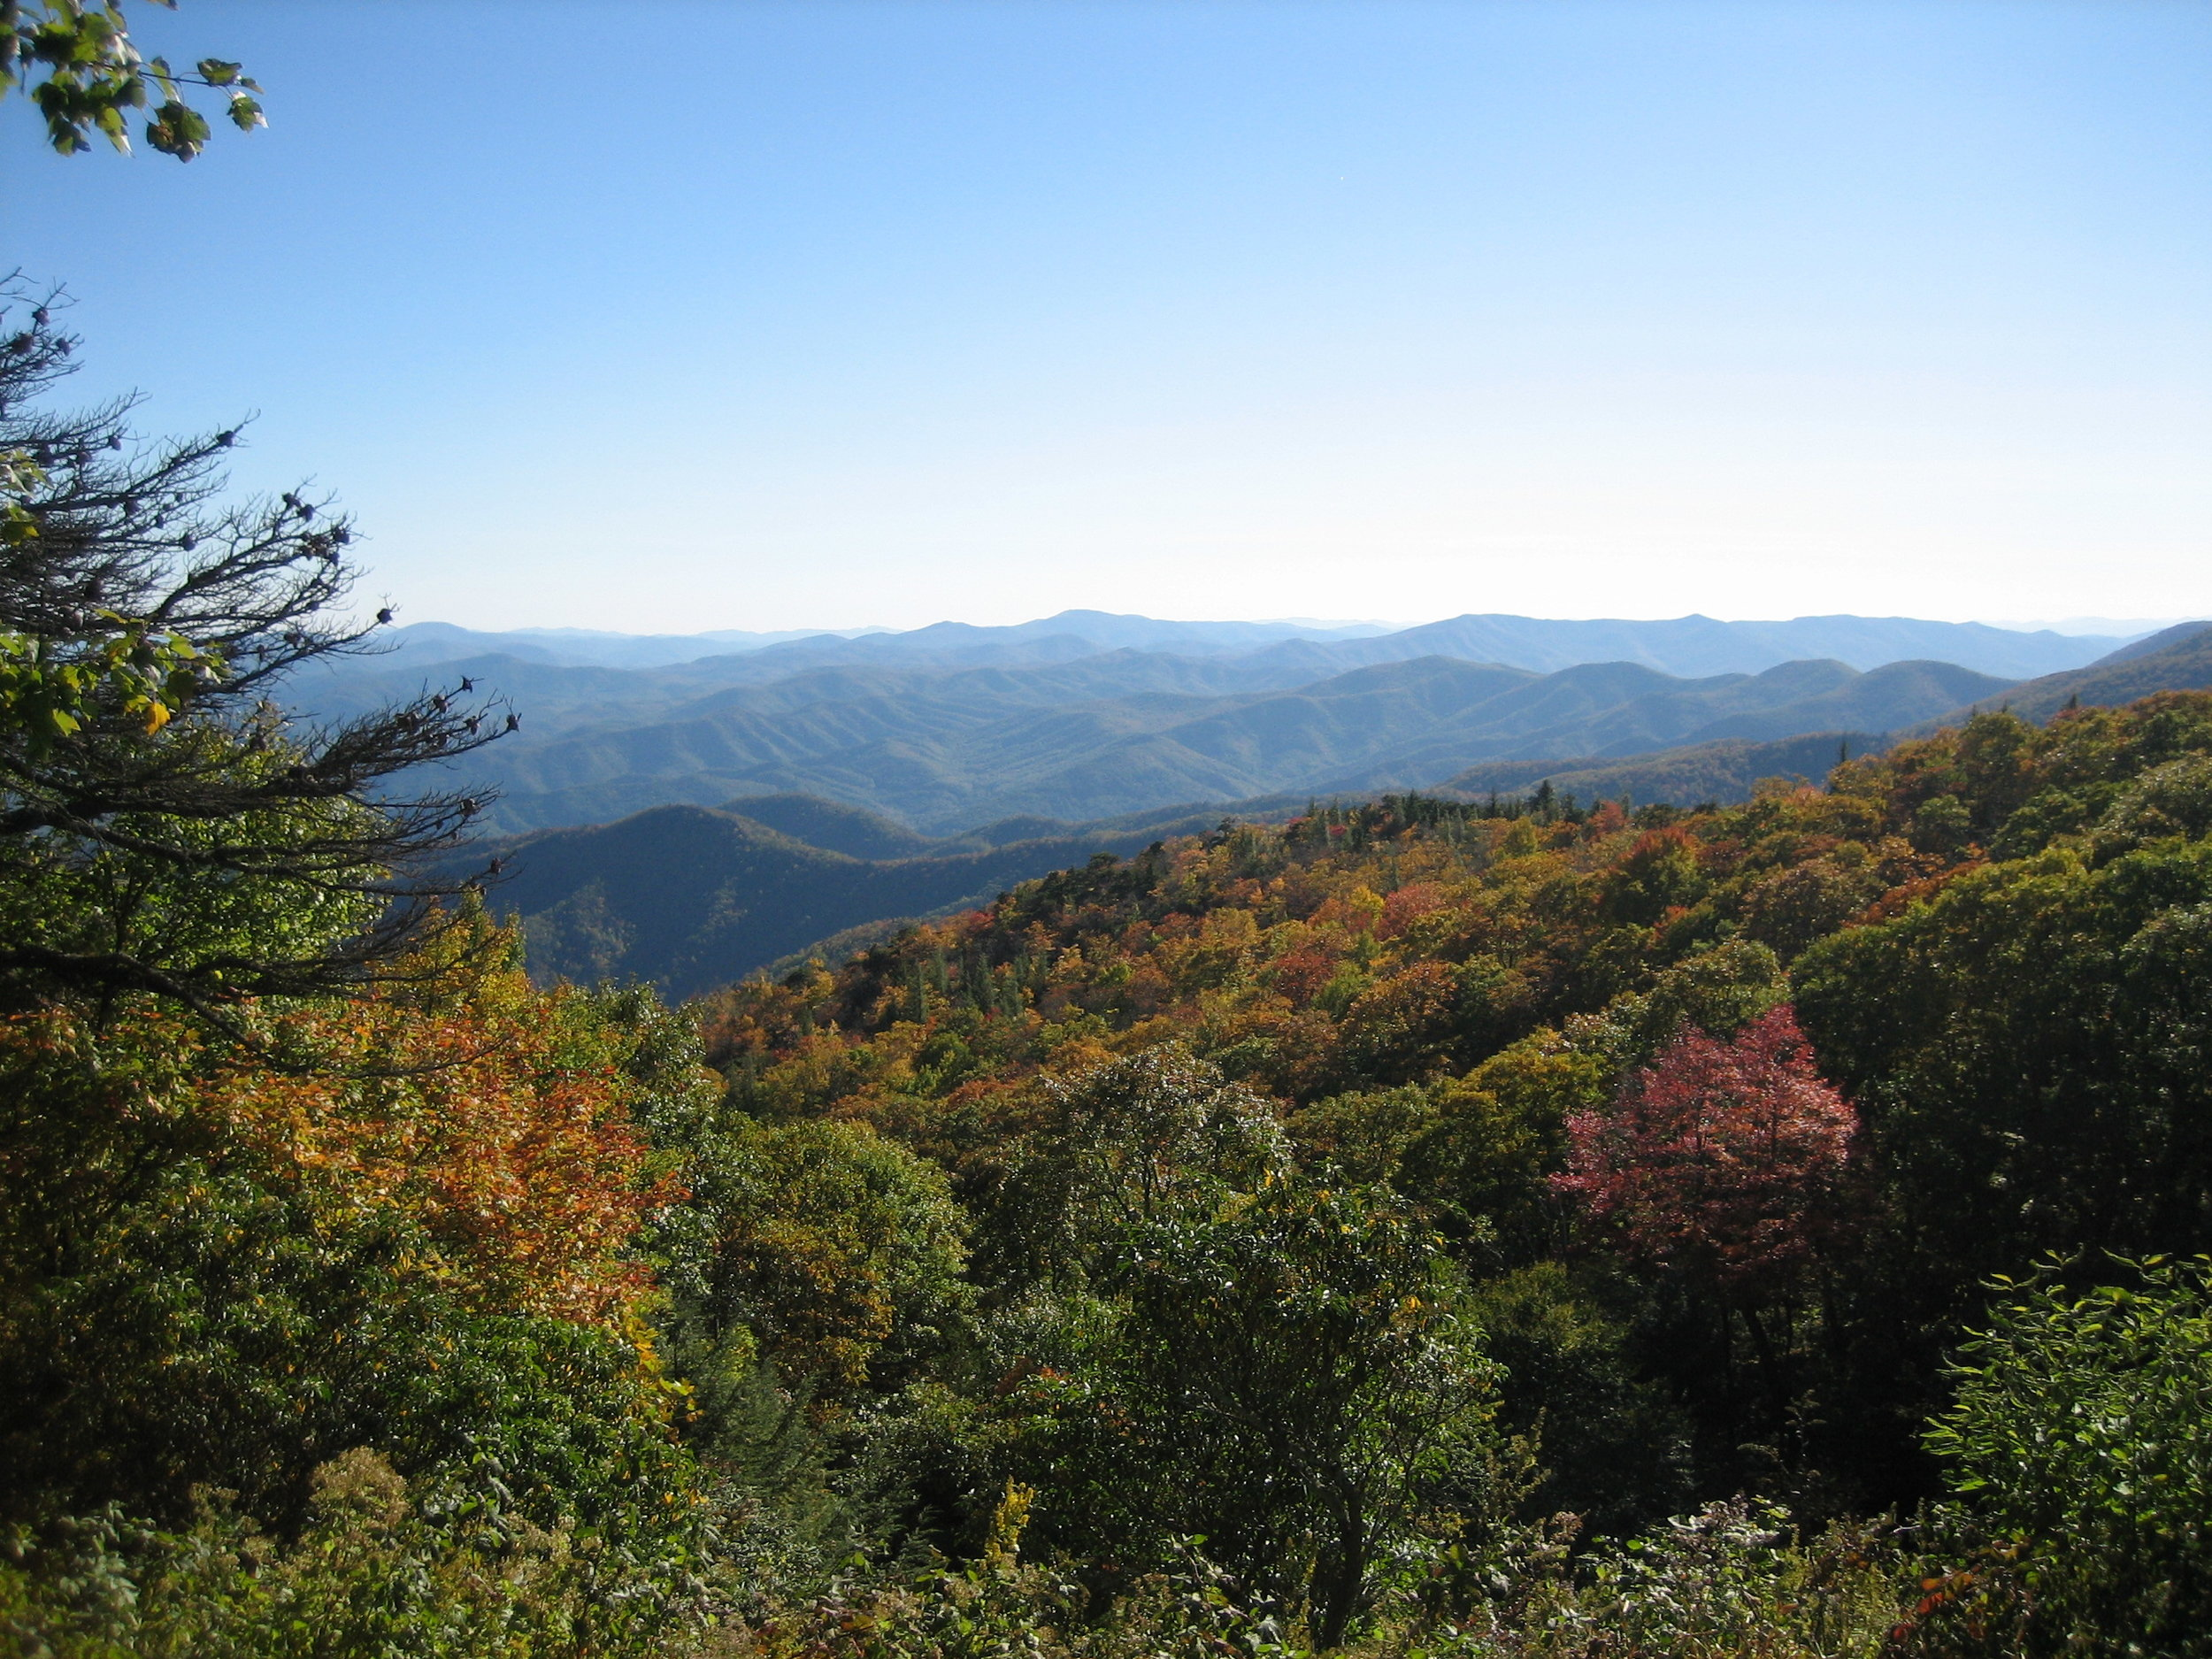 Blue Ridge Mountains, Asheville, NC